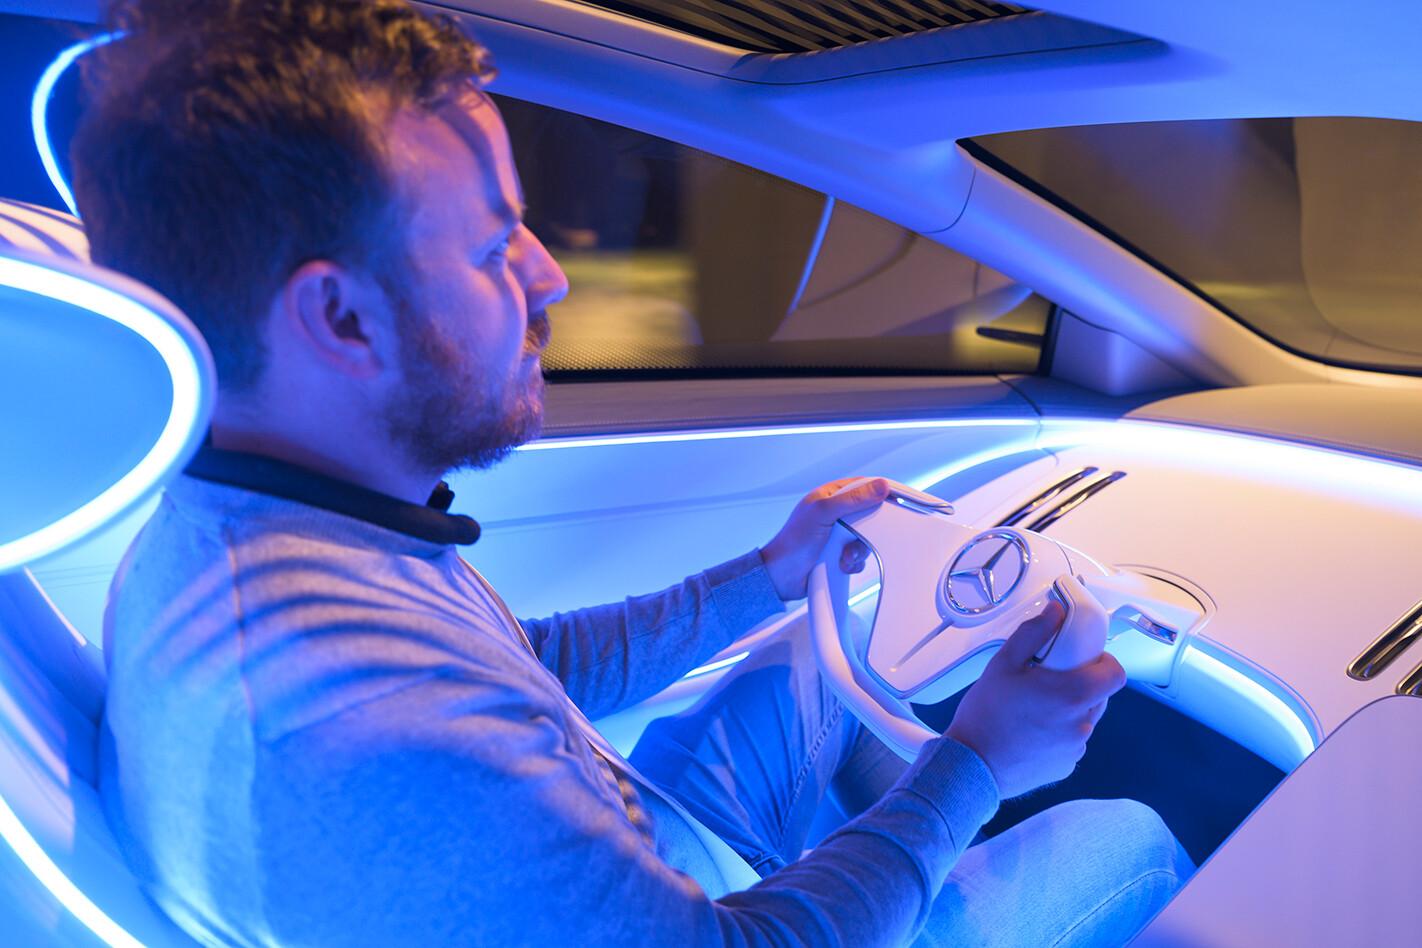 2020 Mercedes-Benz EQS concept - driving experience